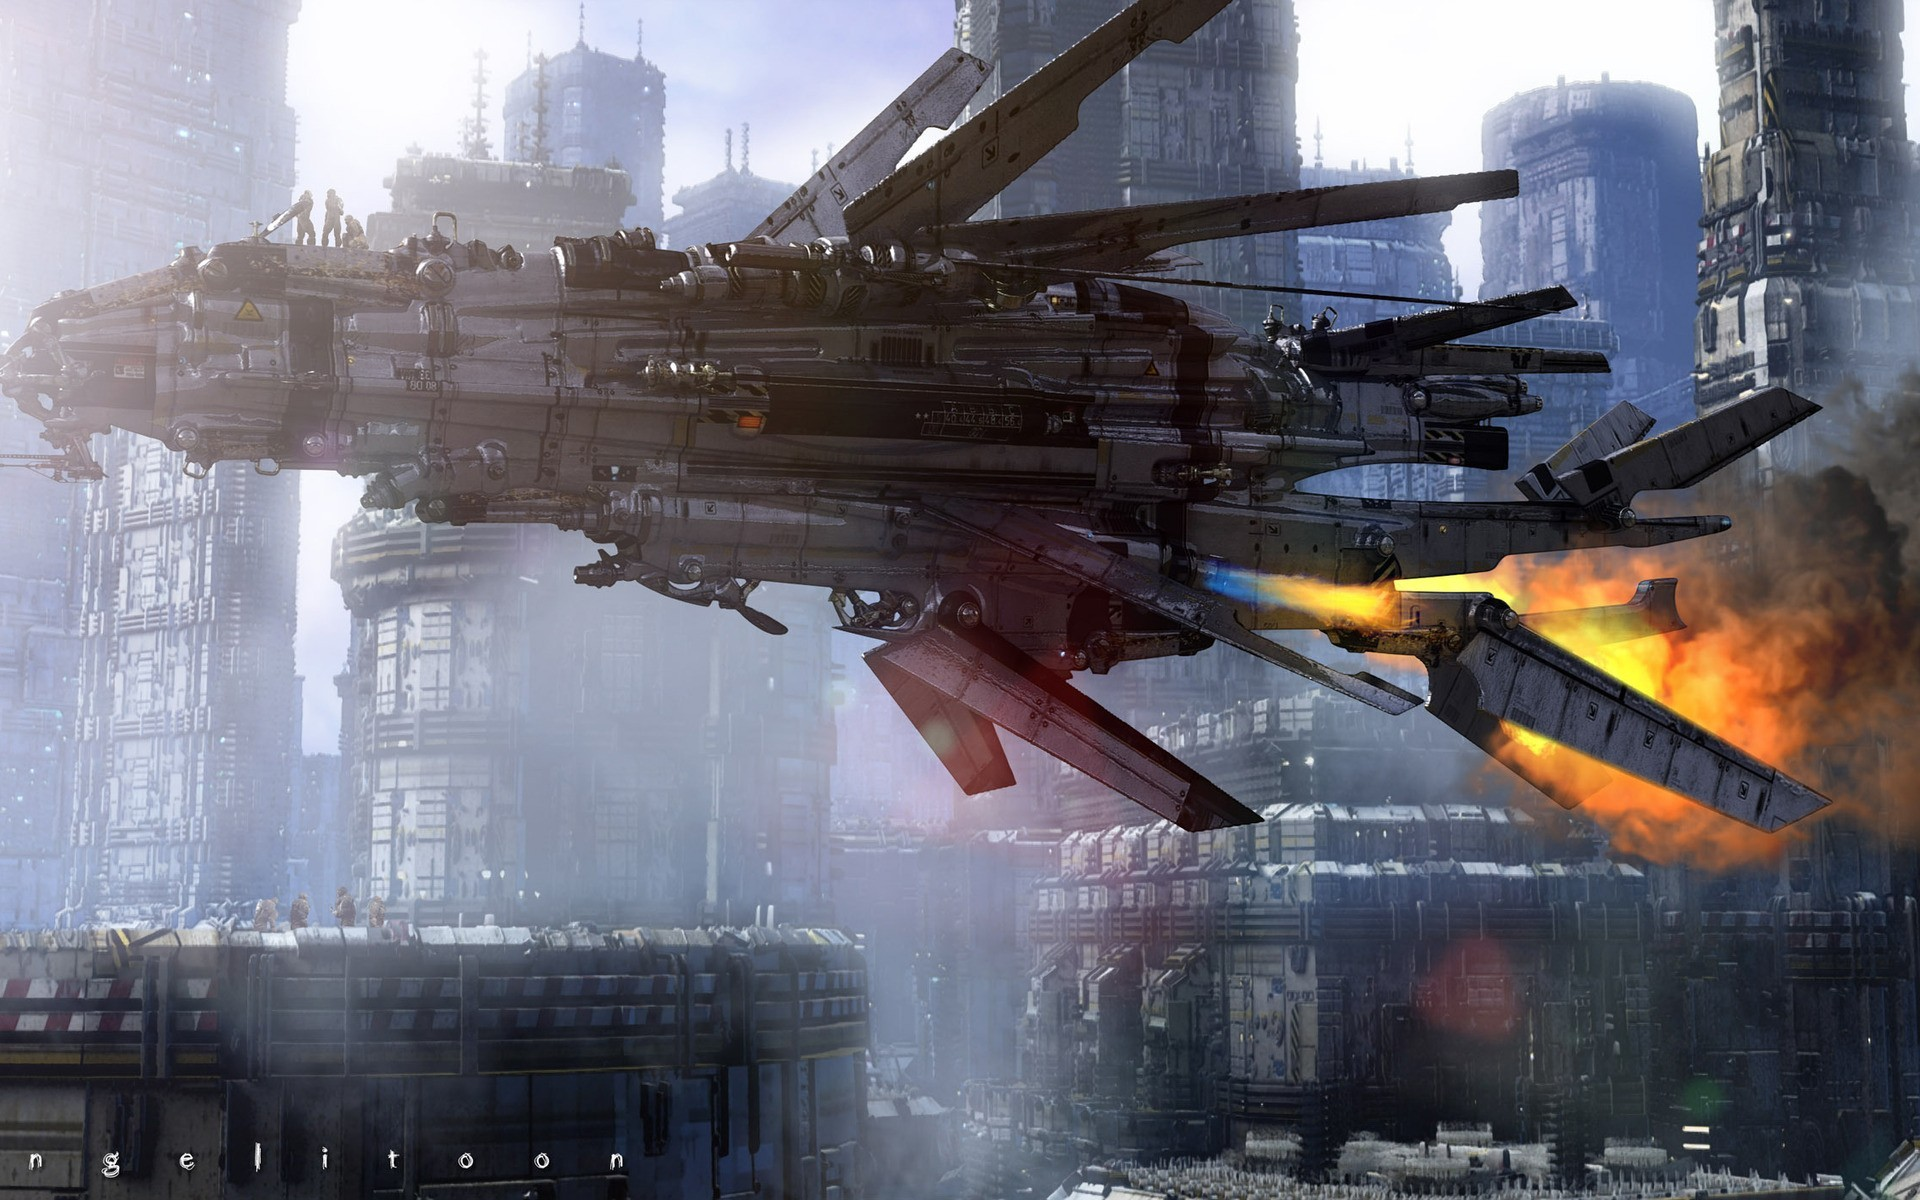 General 1920x1200 science fiction spaceship artwork futuristic futuristic city vehicle